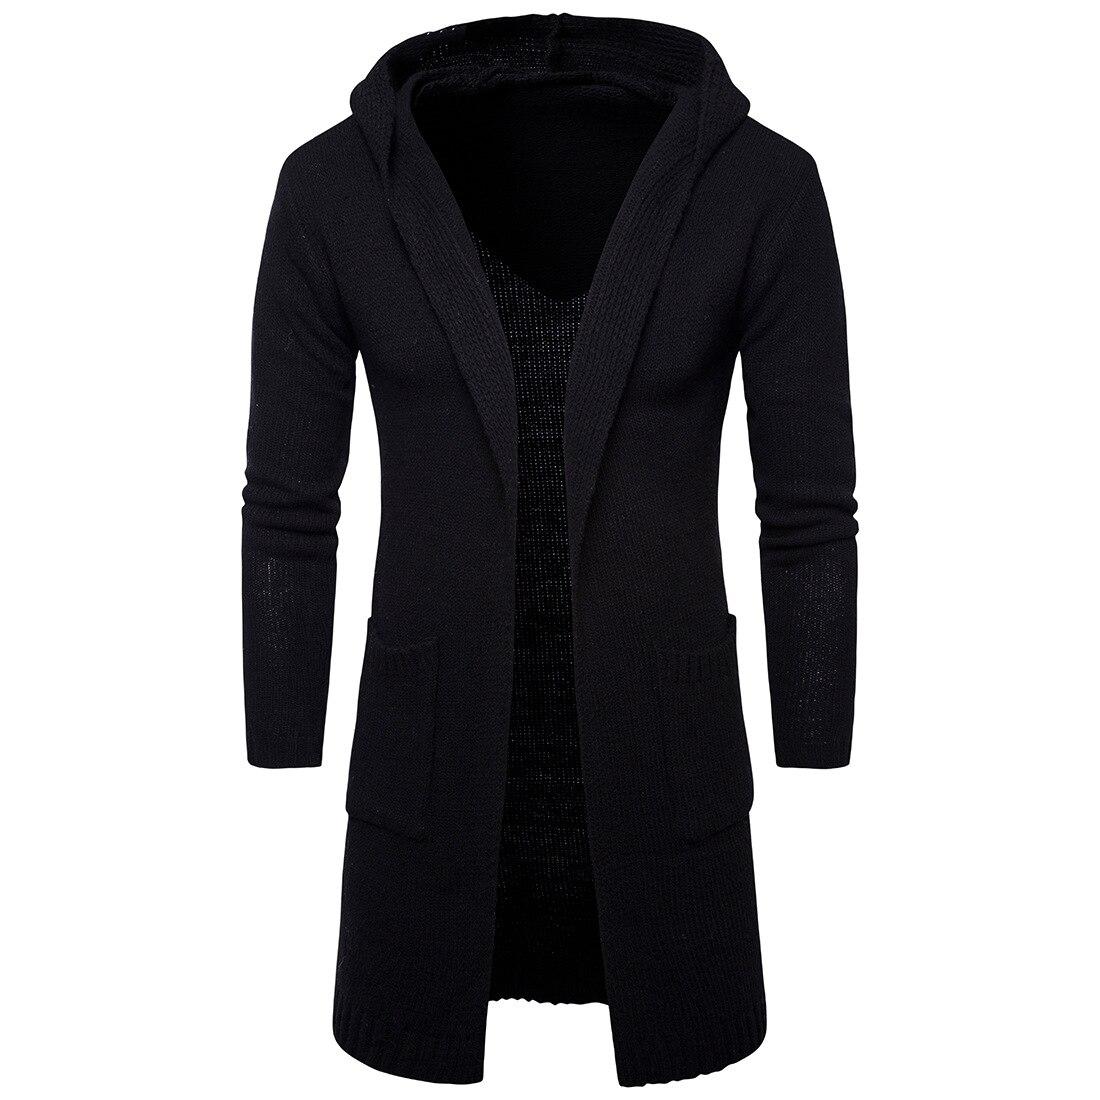 New Autumn Winter Bomber Leather Jacket Men Outwear Warm Thick Military Flight Multi Pocket Pilot Faux